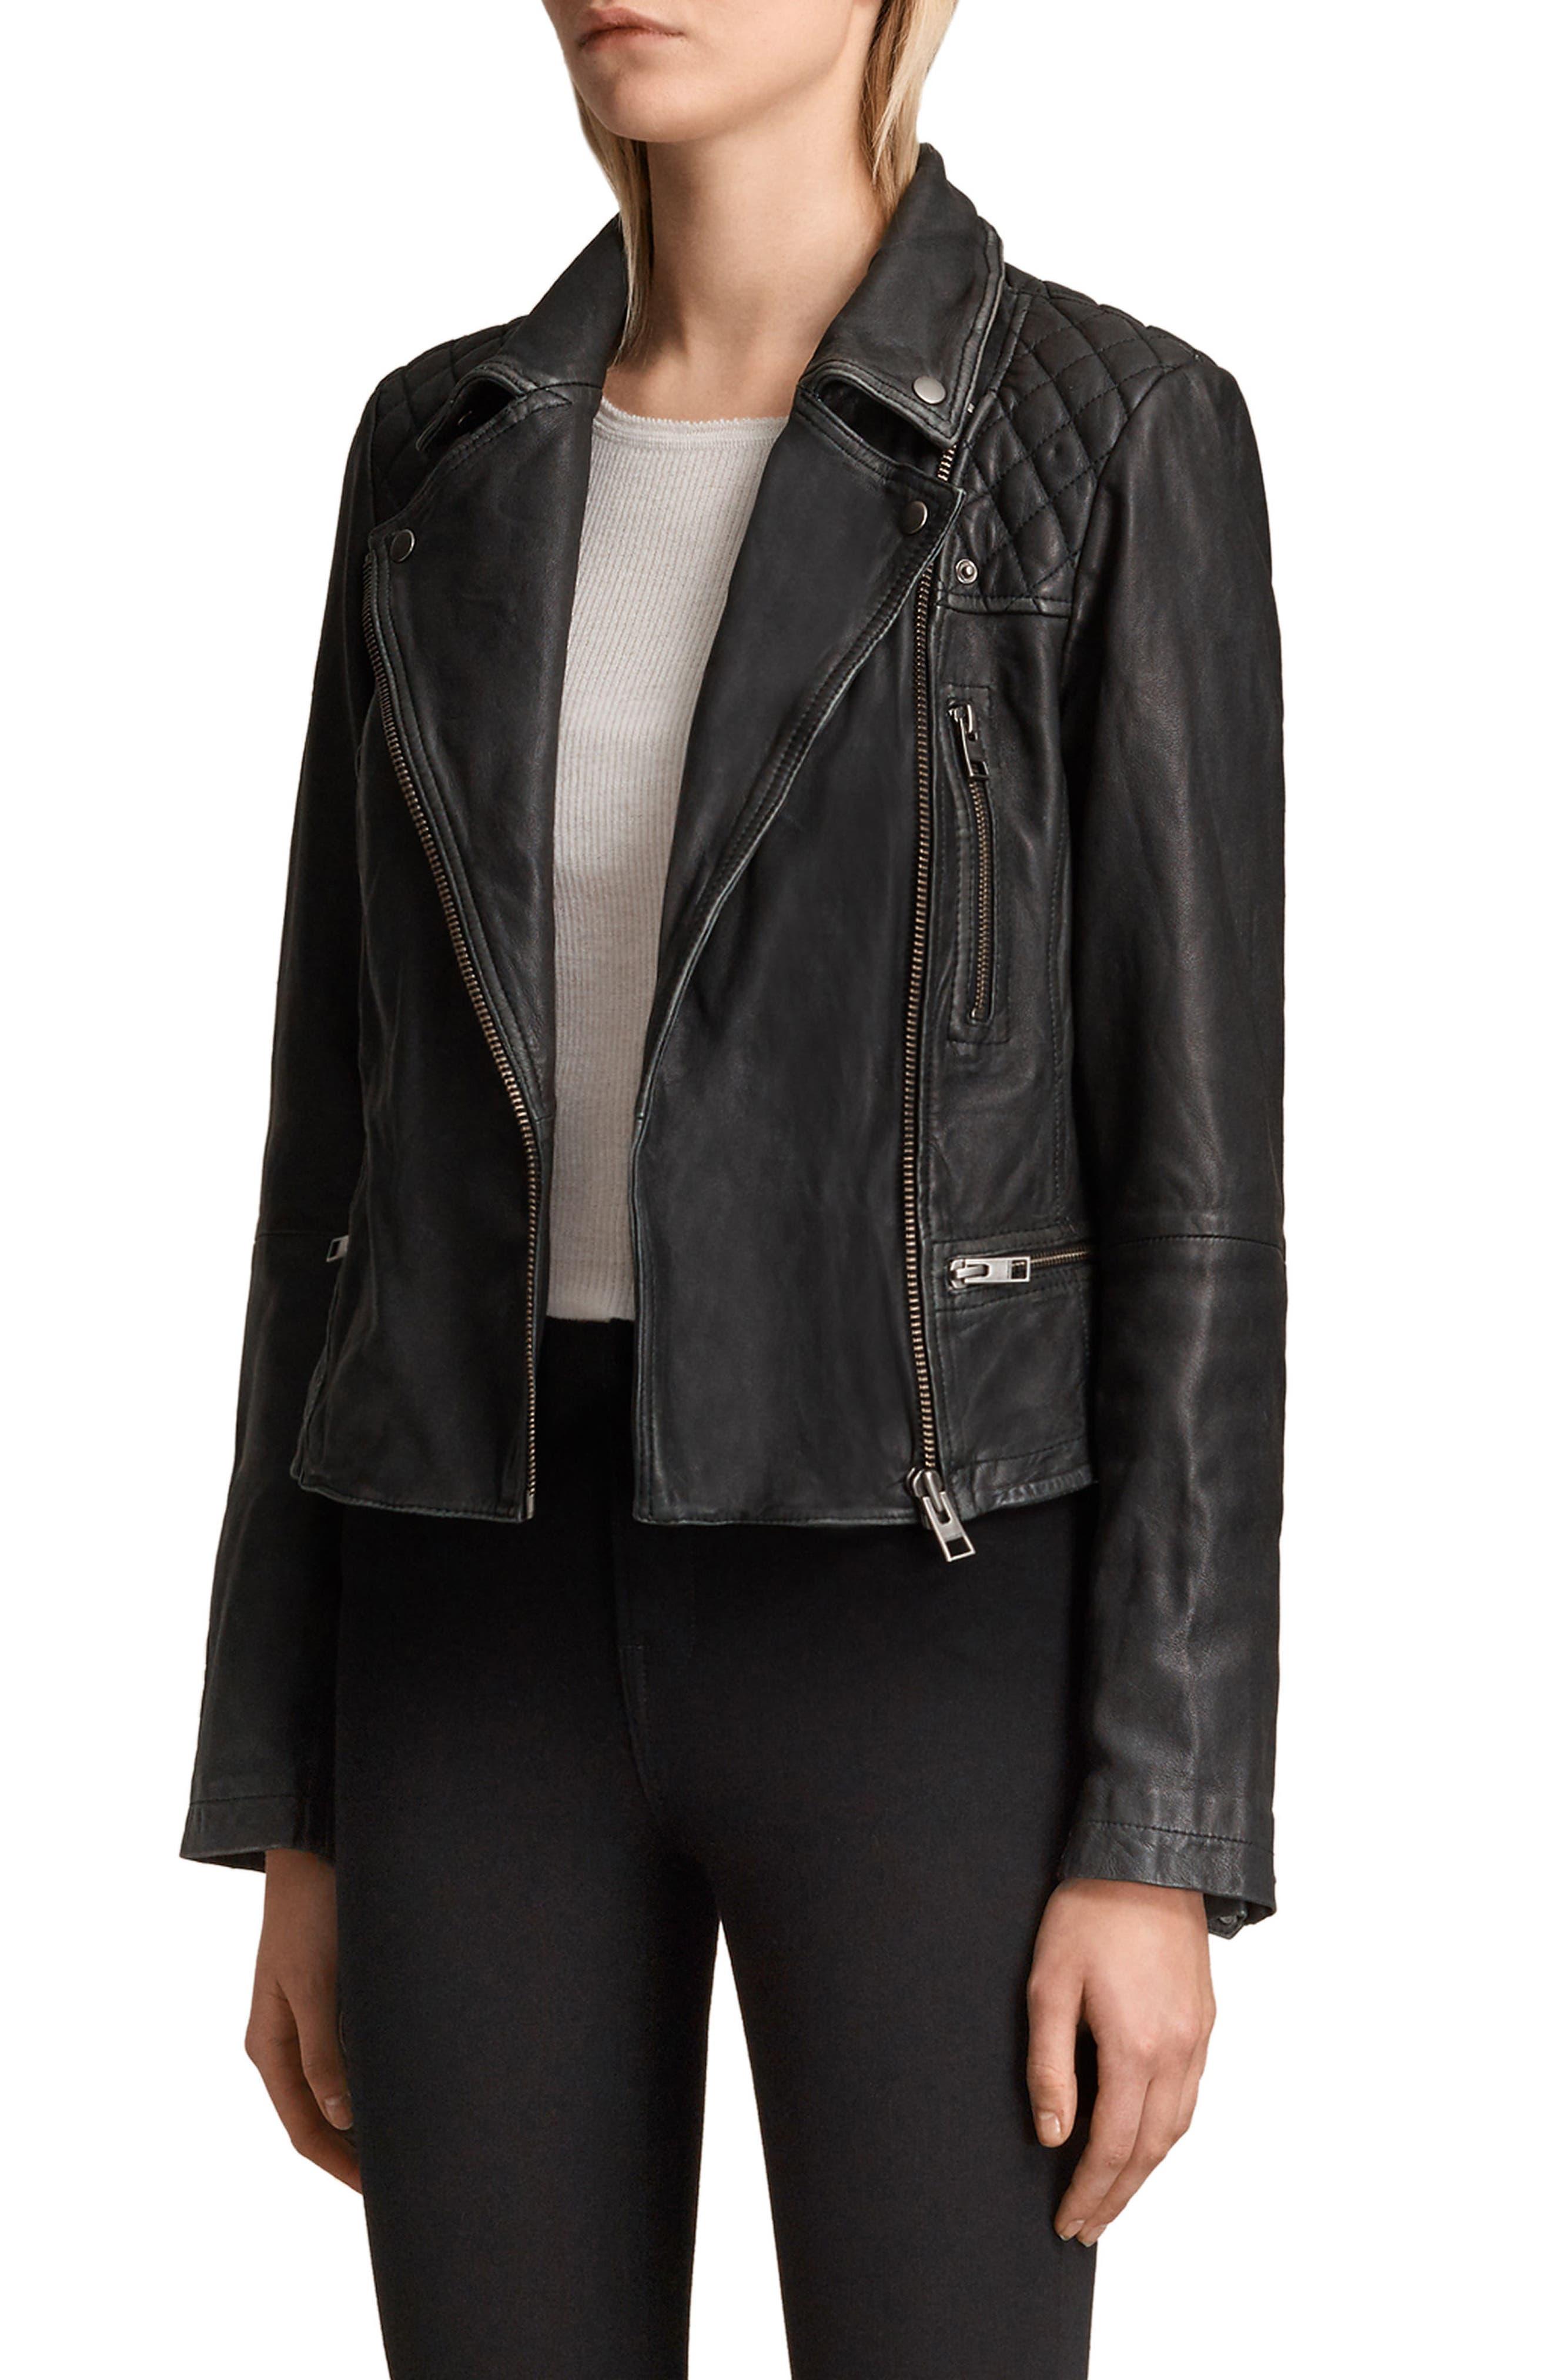 Cargo Leather Biker Jacket,                             Alternate thumbnail 3, color,                             Black/ Grey